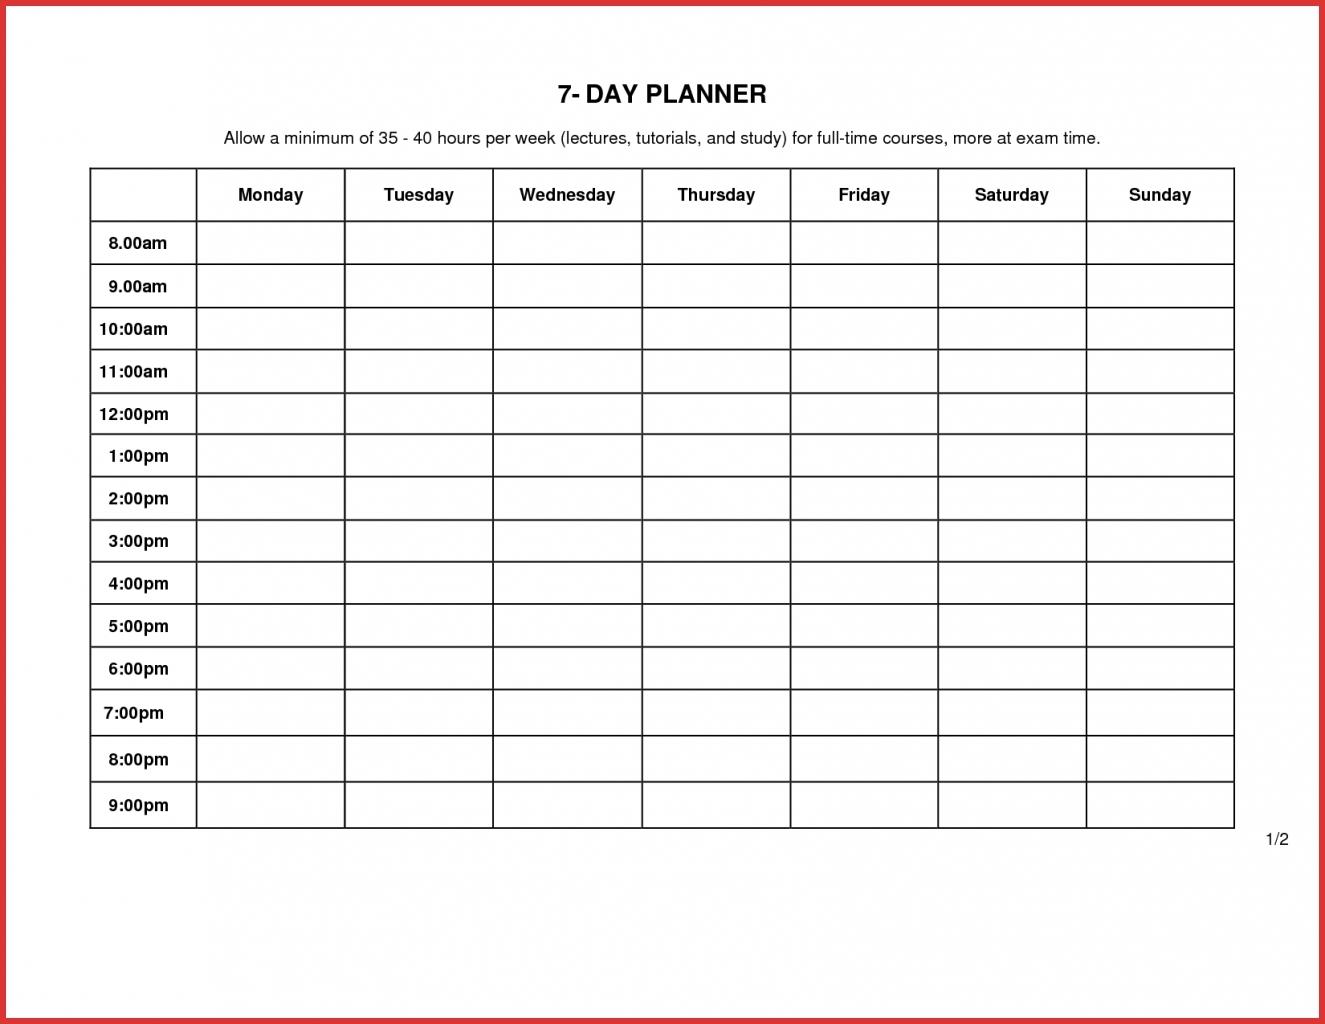 Day Week Calendar Template Schedule Blank E2 80 93 Printable | Smorad throughout 7 Day 12 Week Planner Blank